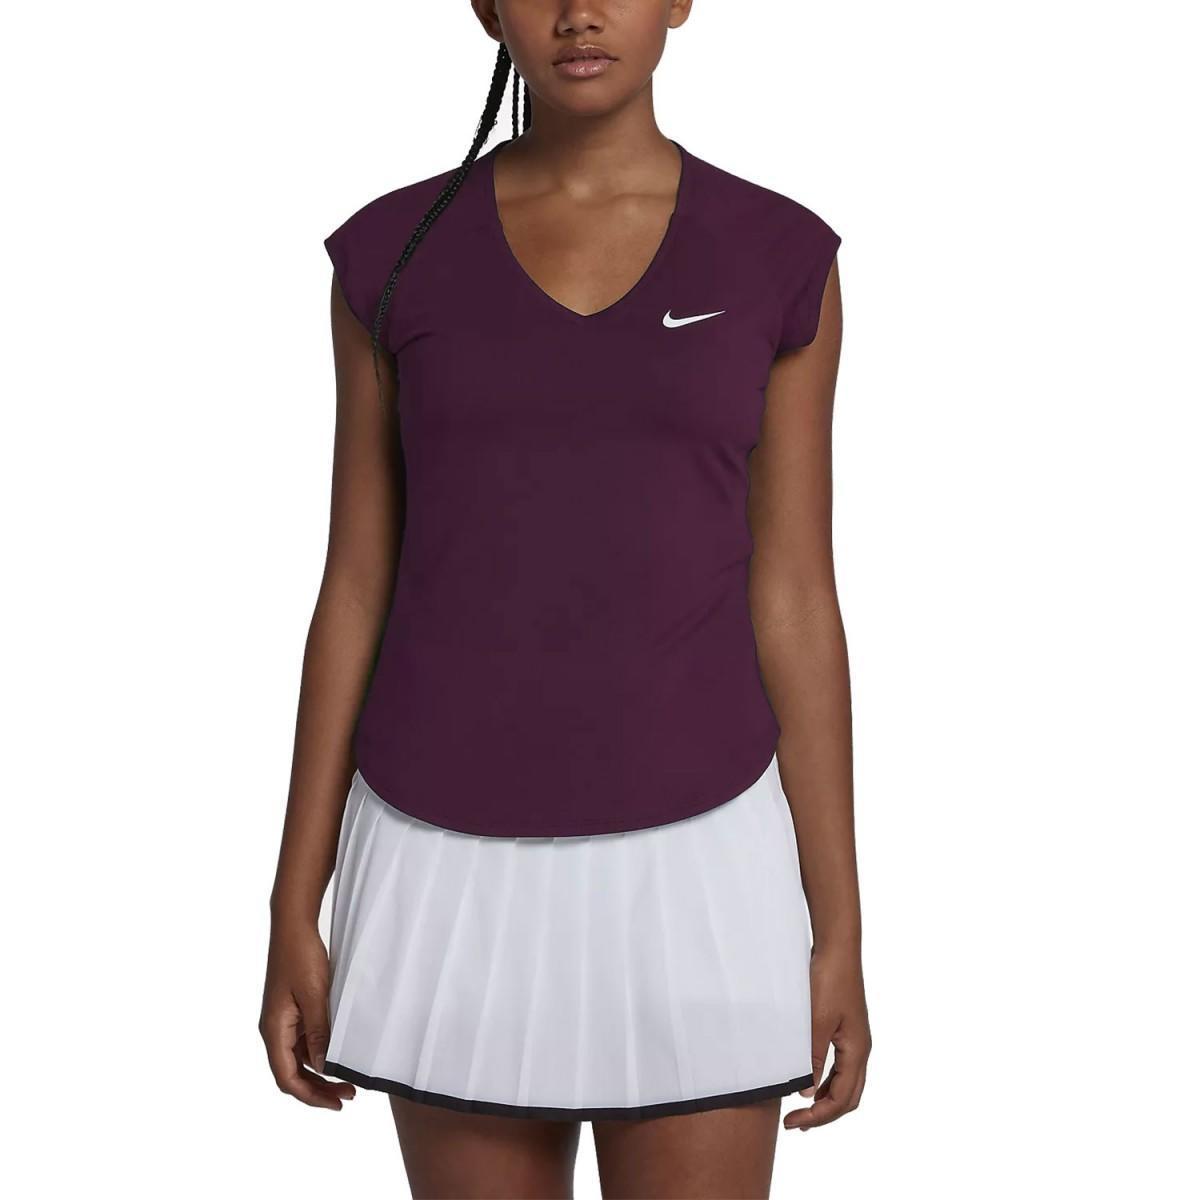 Теннисная футболка женская Nike Court Pure Top purple/white